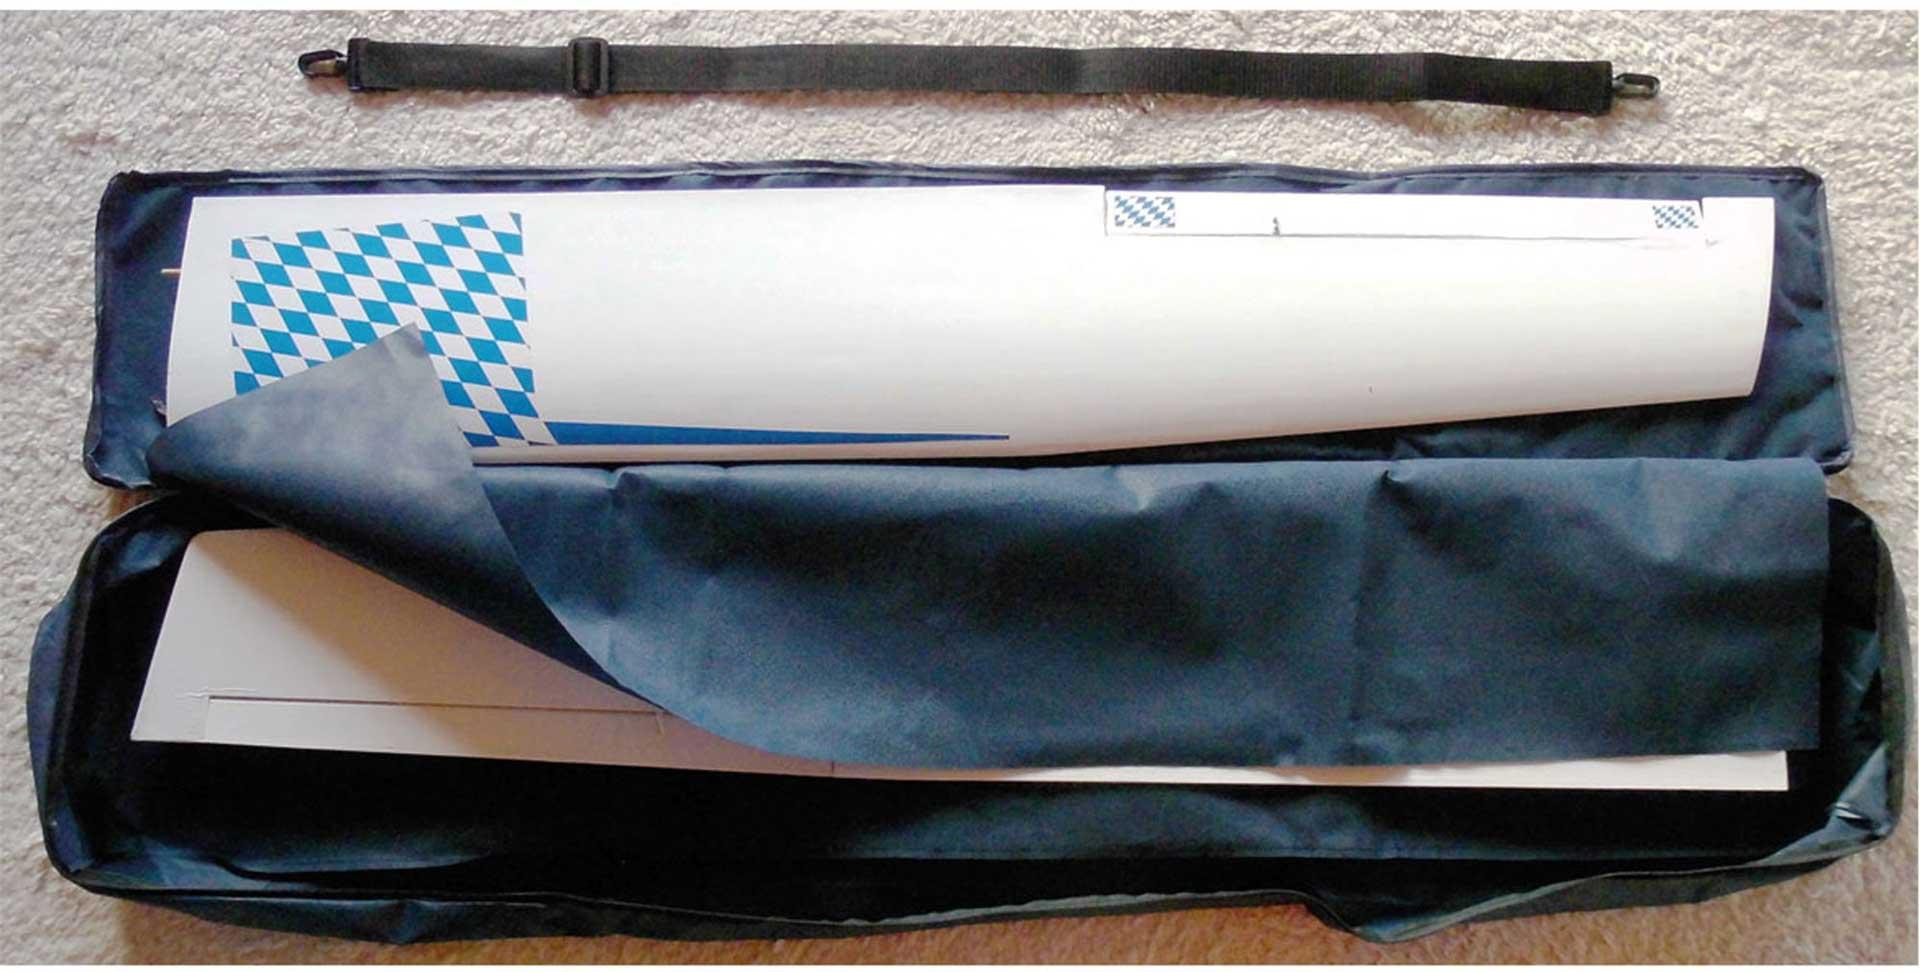 MODELLBAU LINDINGER MODEL BACKPACK 175 175/34/13CM TRANSPORT BACKPACK FOR GLIDERS